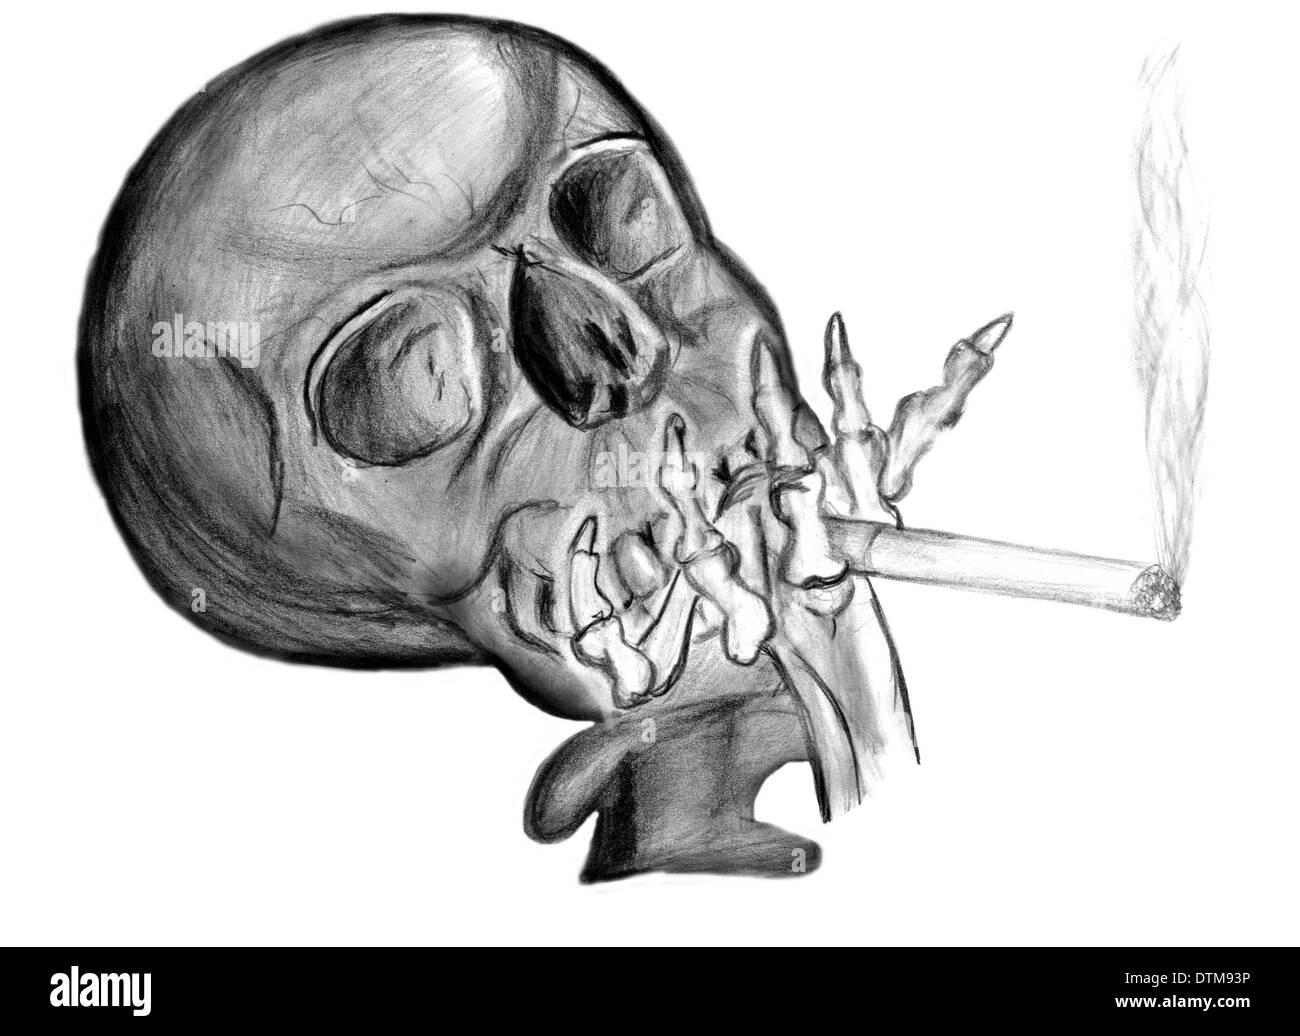 Smoking drawing stock photos smoking drawing stock images